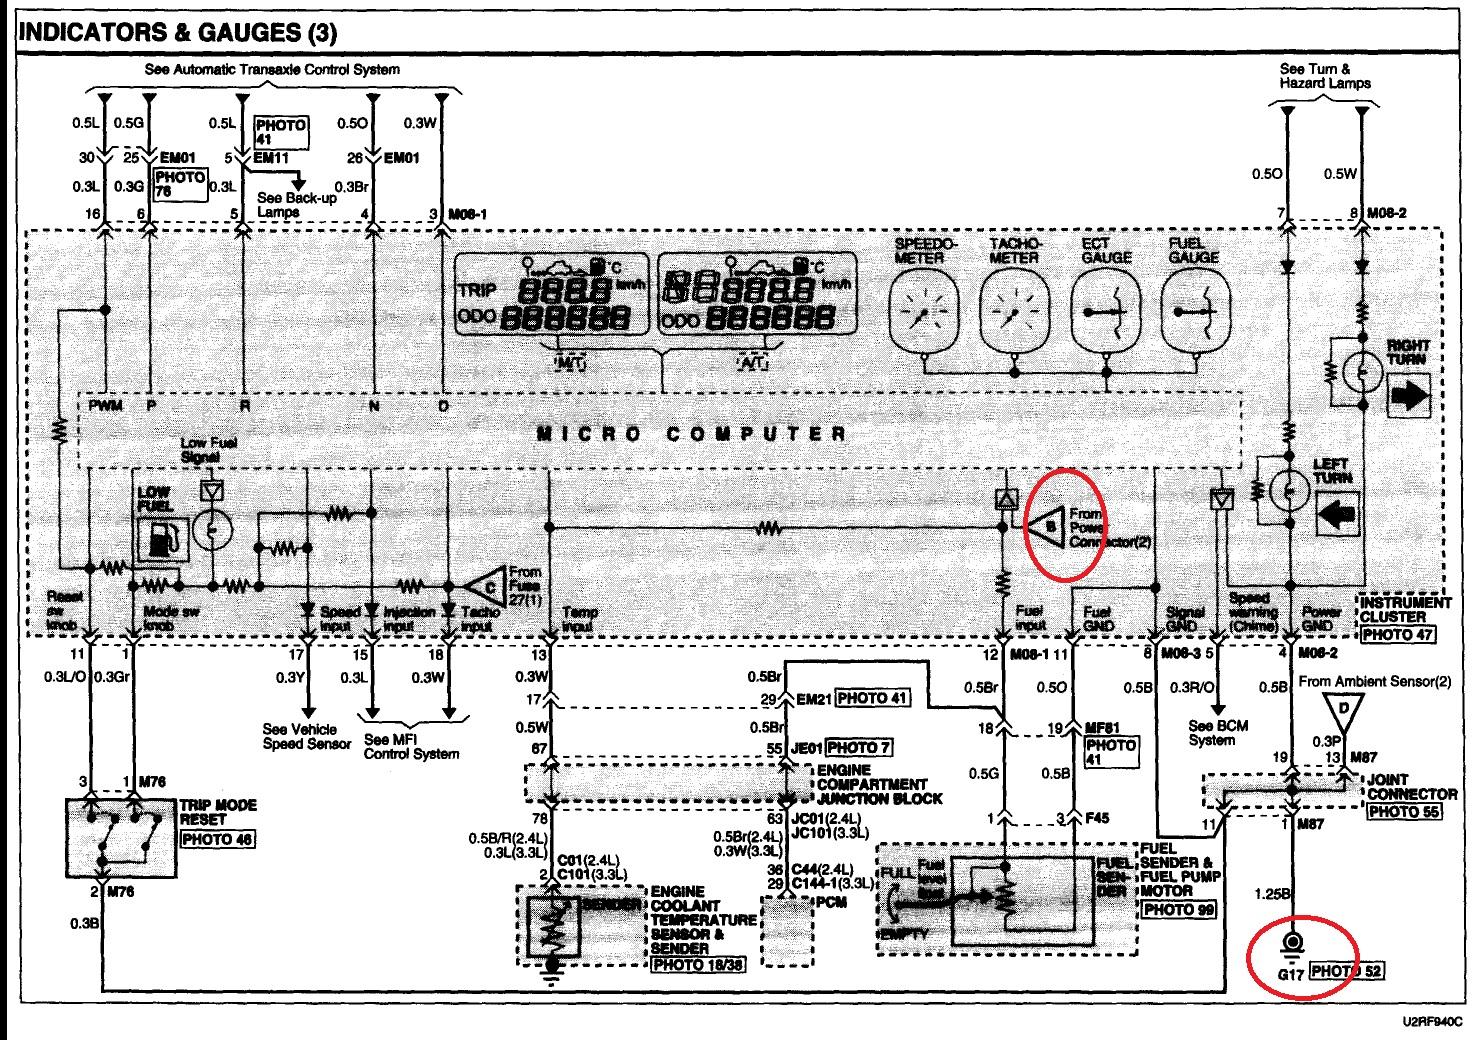 06 Hyundai Tiburon Wiring Diagram Library Santa Fe Harness Accent 28 Images 2003 Gt Get